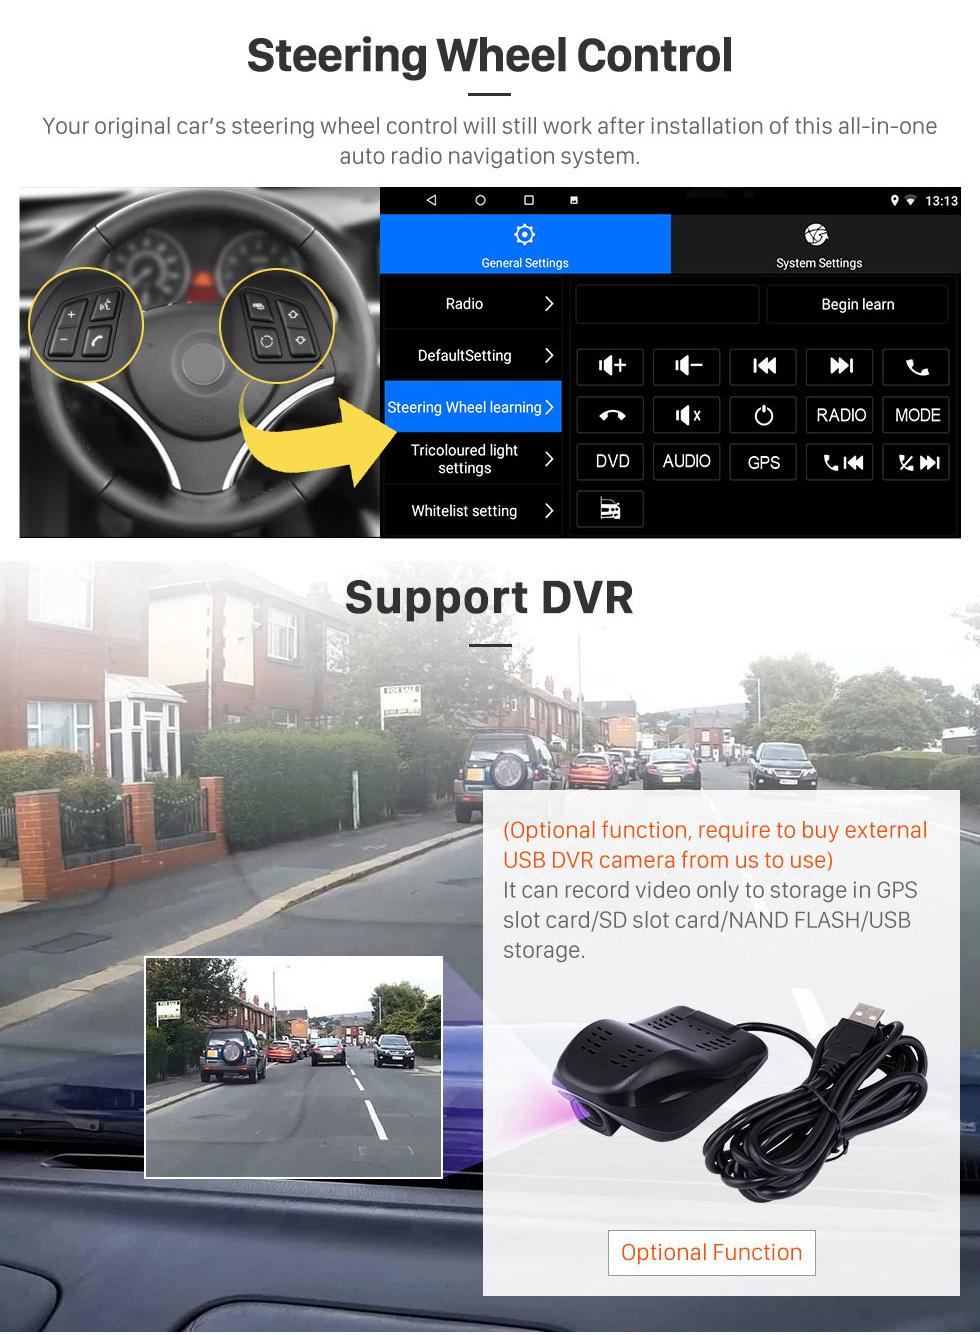 Seicane OEM 9 inch Android 10.0 Radio for 2005-2014 Old Suzuki Vitara Bluetooth WIFI HD Touchscreen GPS Navigation support Carplay DVR OBD2